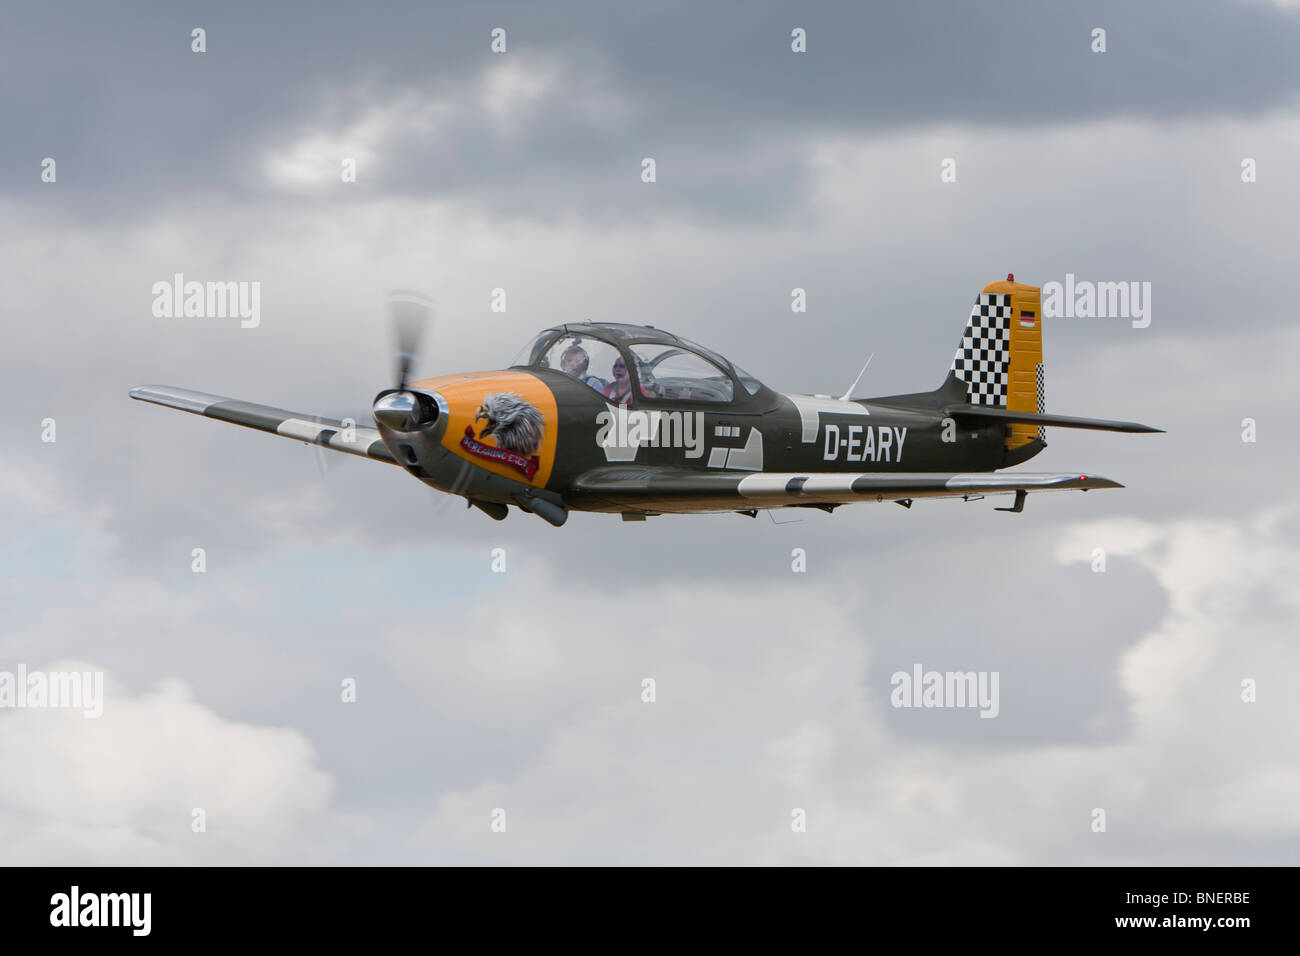 Focke-Wulf FWP-149D, reg. D-EARY, at Breighton - Stock Image